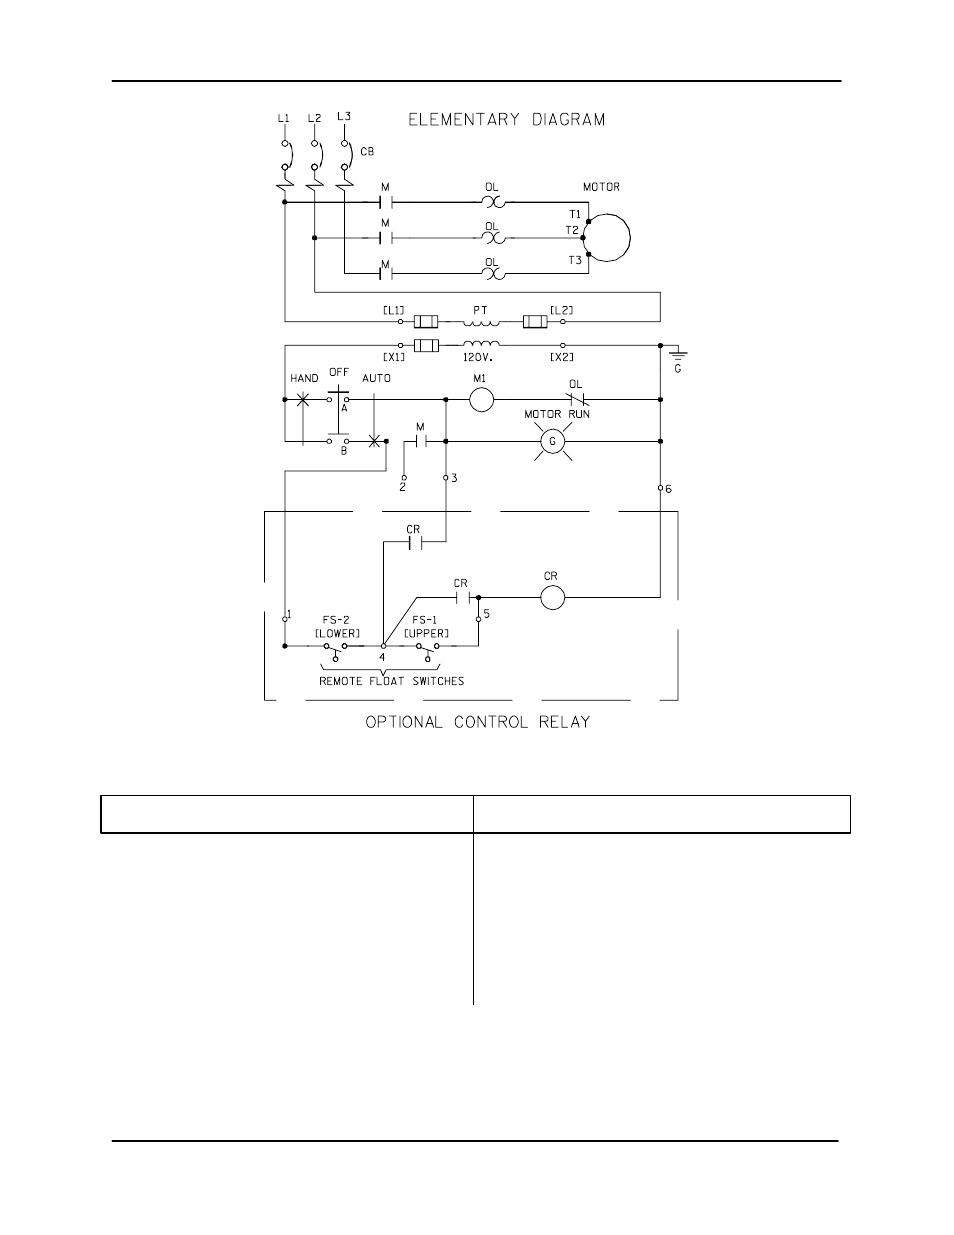 Schecter Damien 6 Wiring Diagram Jackson Diagrams Auto Solo Guitar Fender Stratocaster